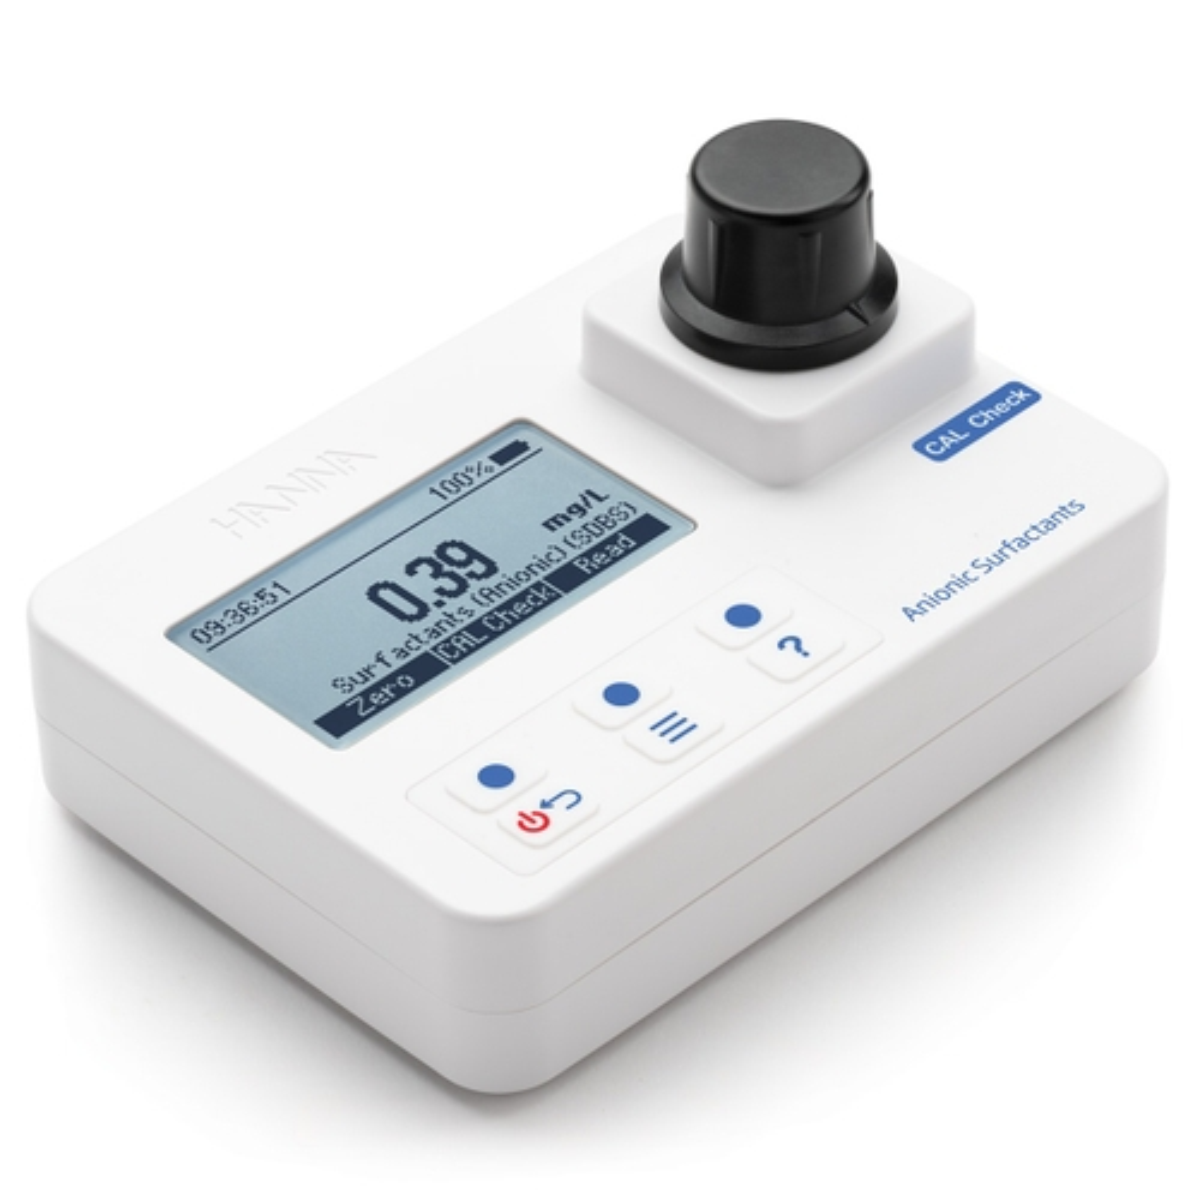 HI97769 Anionic Surfactants Portable Photometer